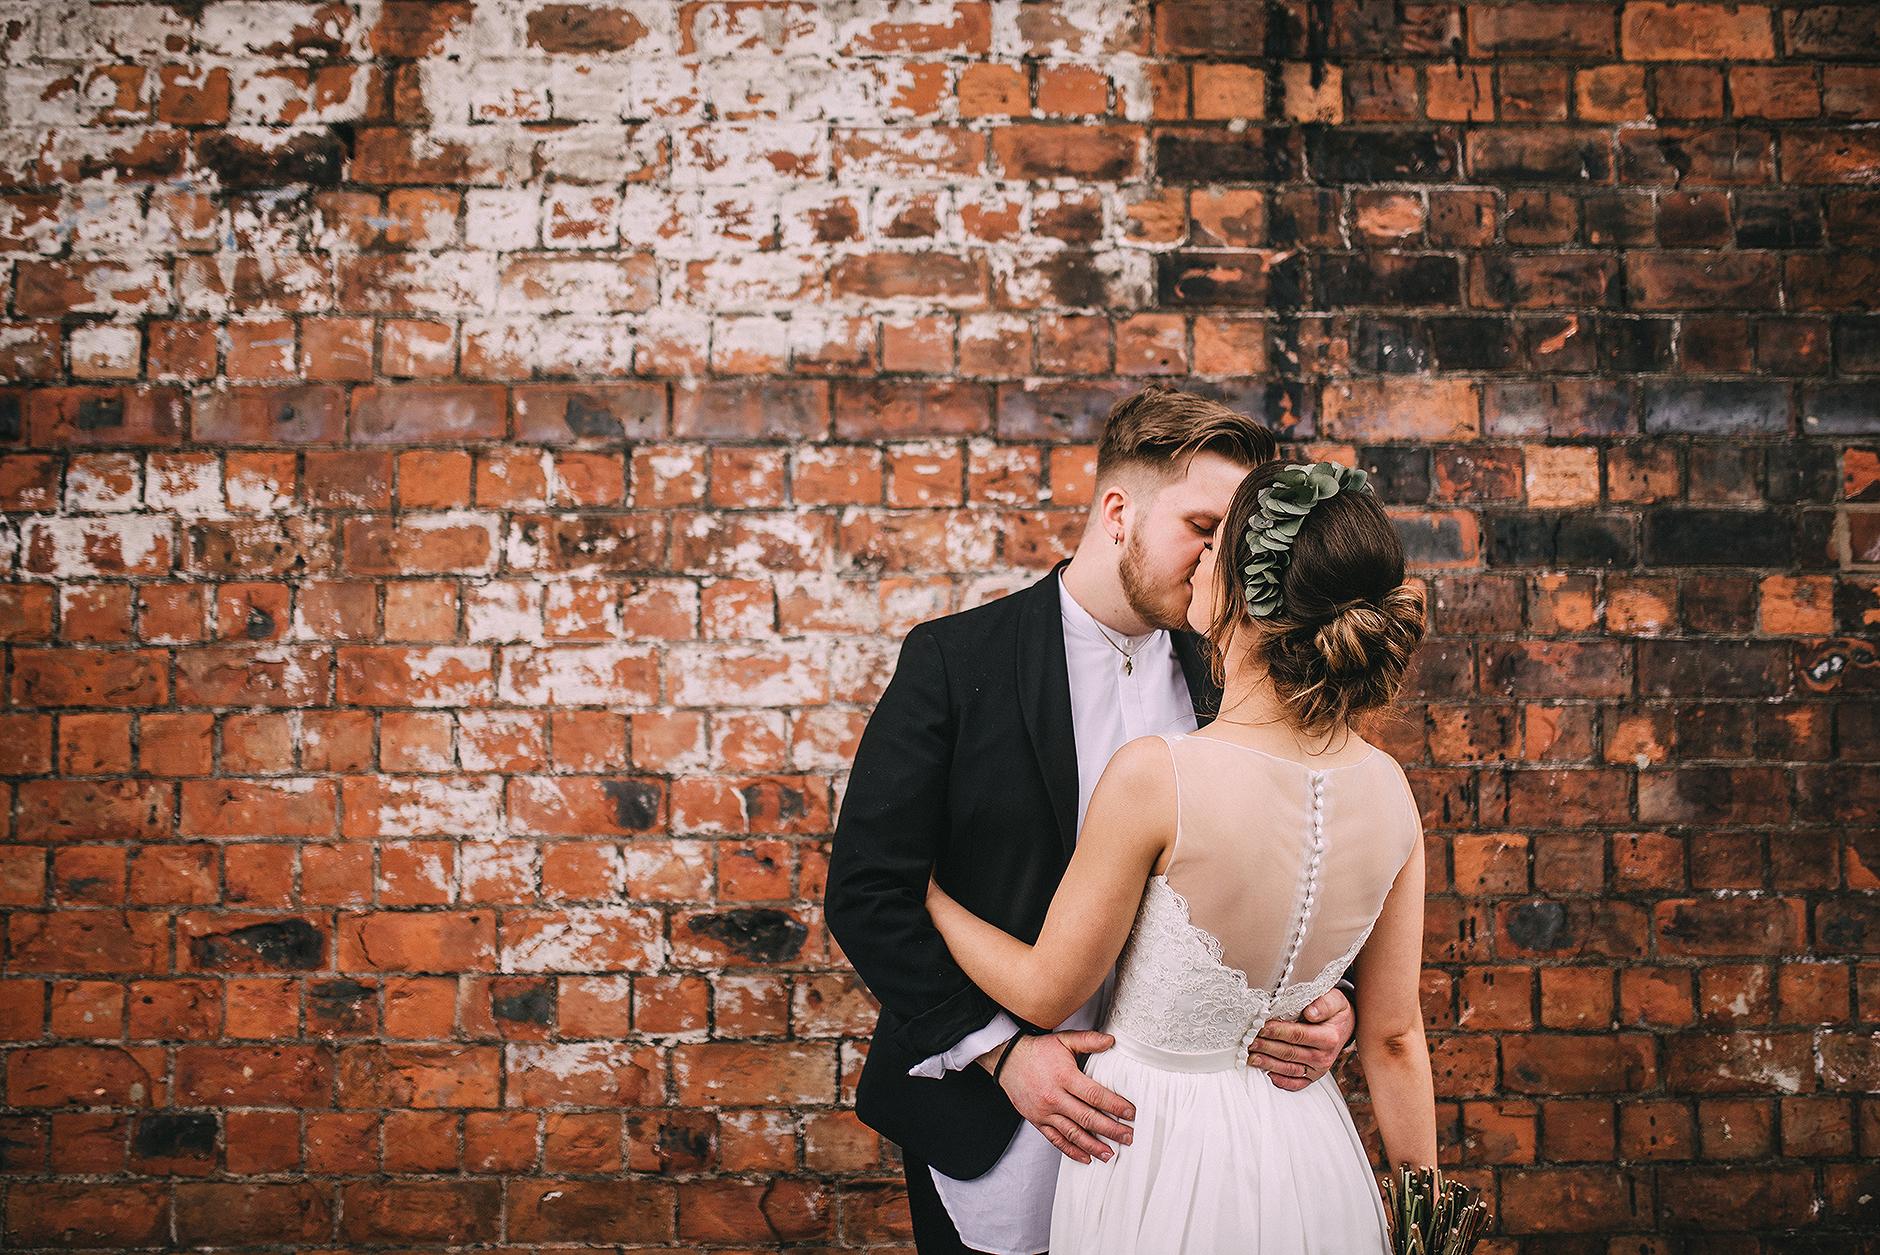 newcastle-clayshed-holly-rose-weddings-EMILYJOE_521(pp_w1880_h1255).jpg